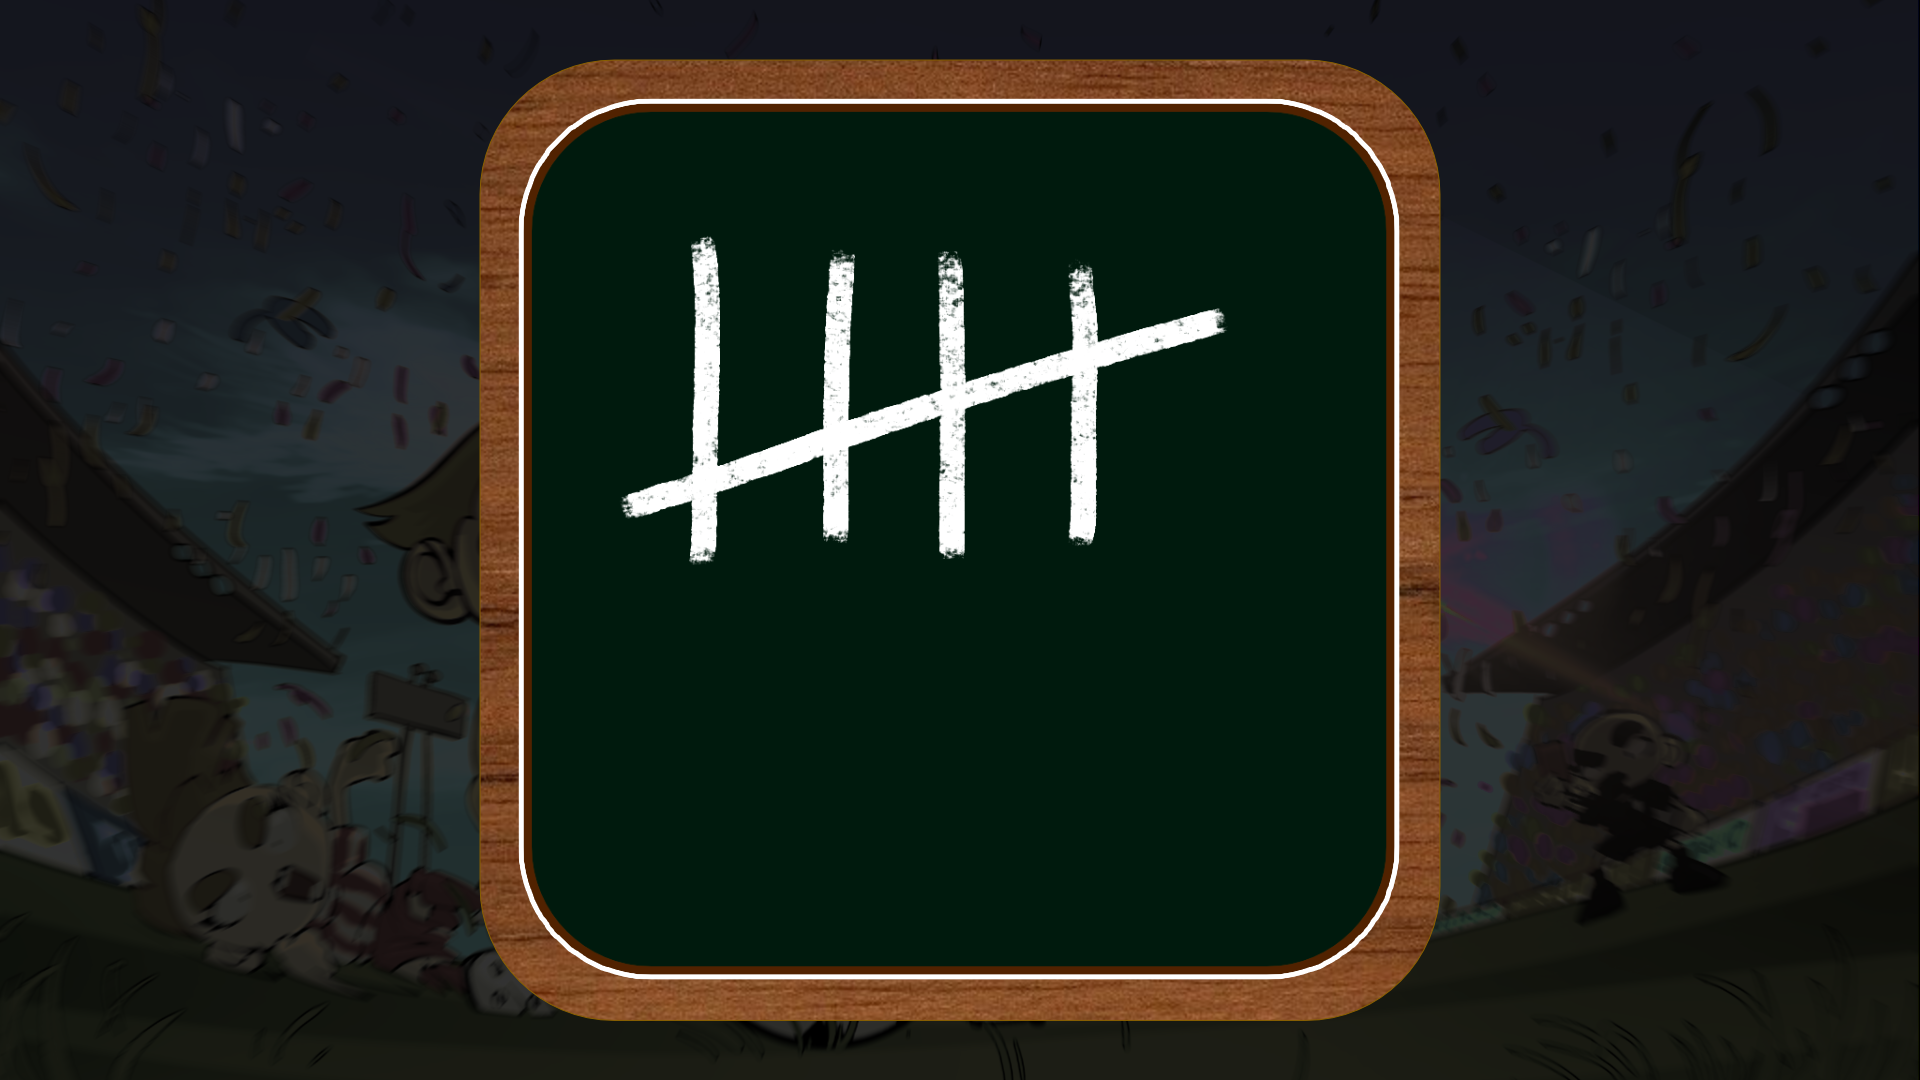 Icon for Winning streak